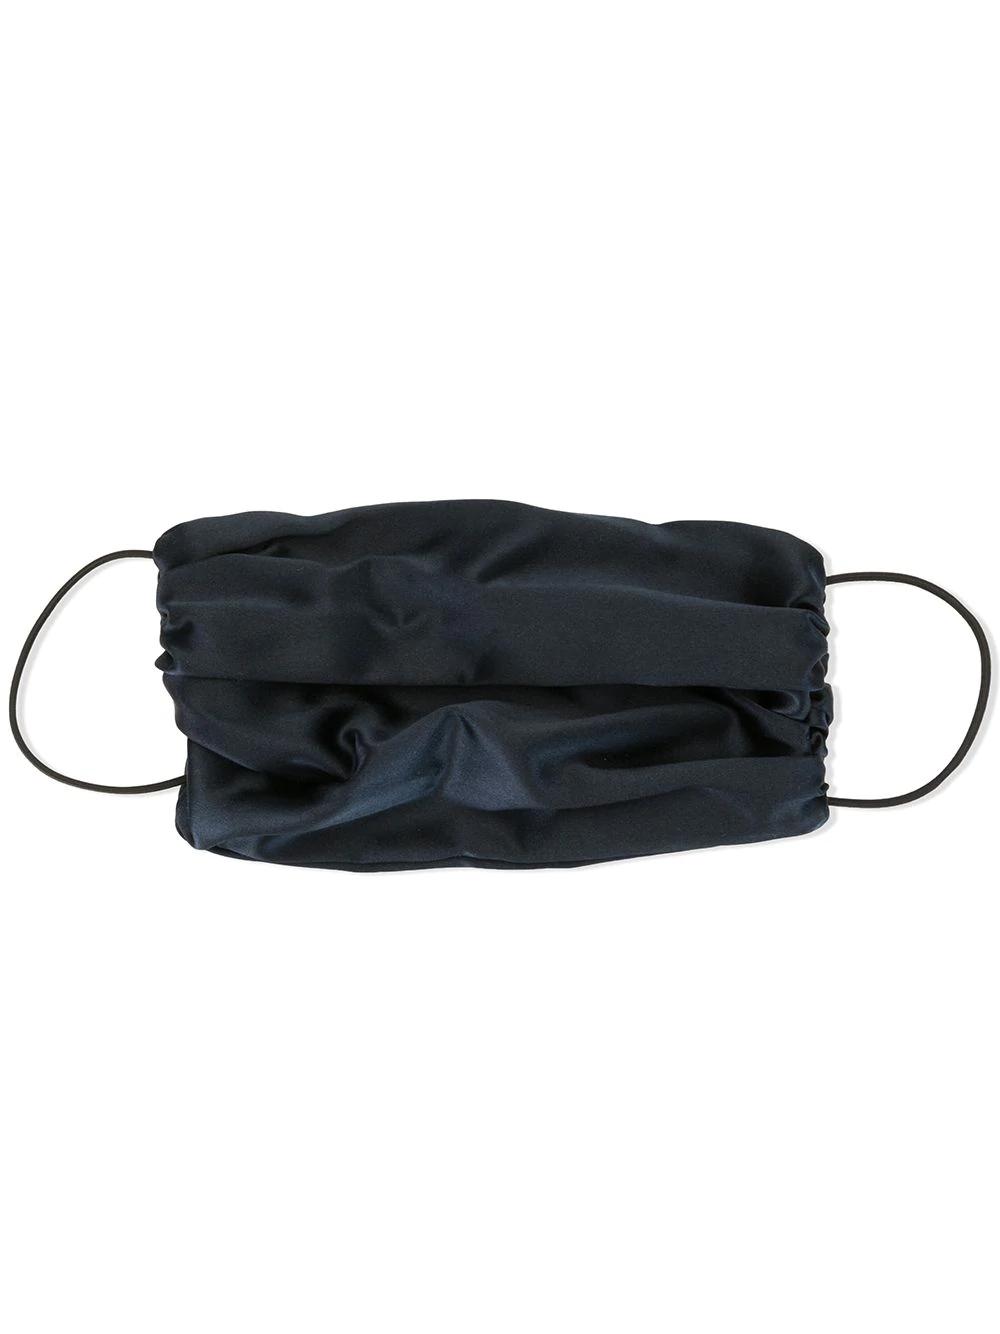 Proenza Schouler Silk Face Mask 185лв